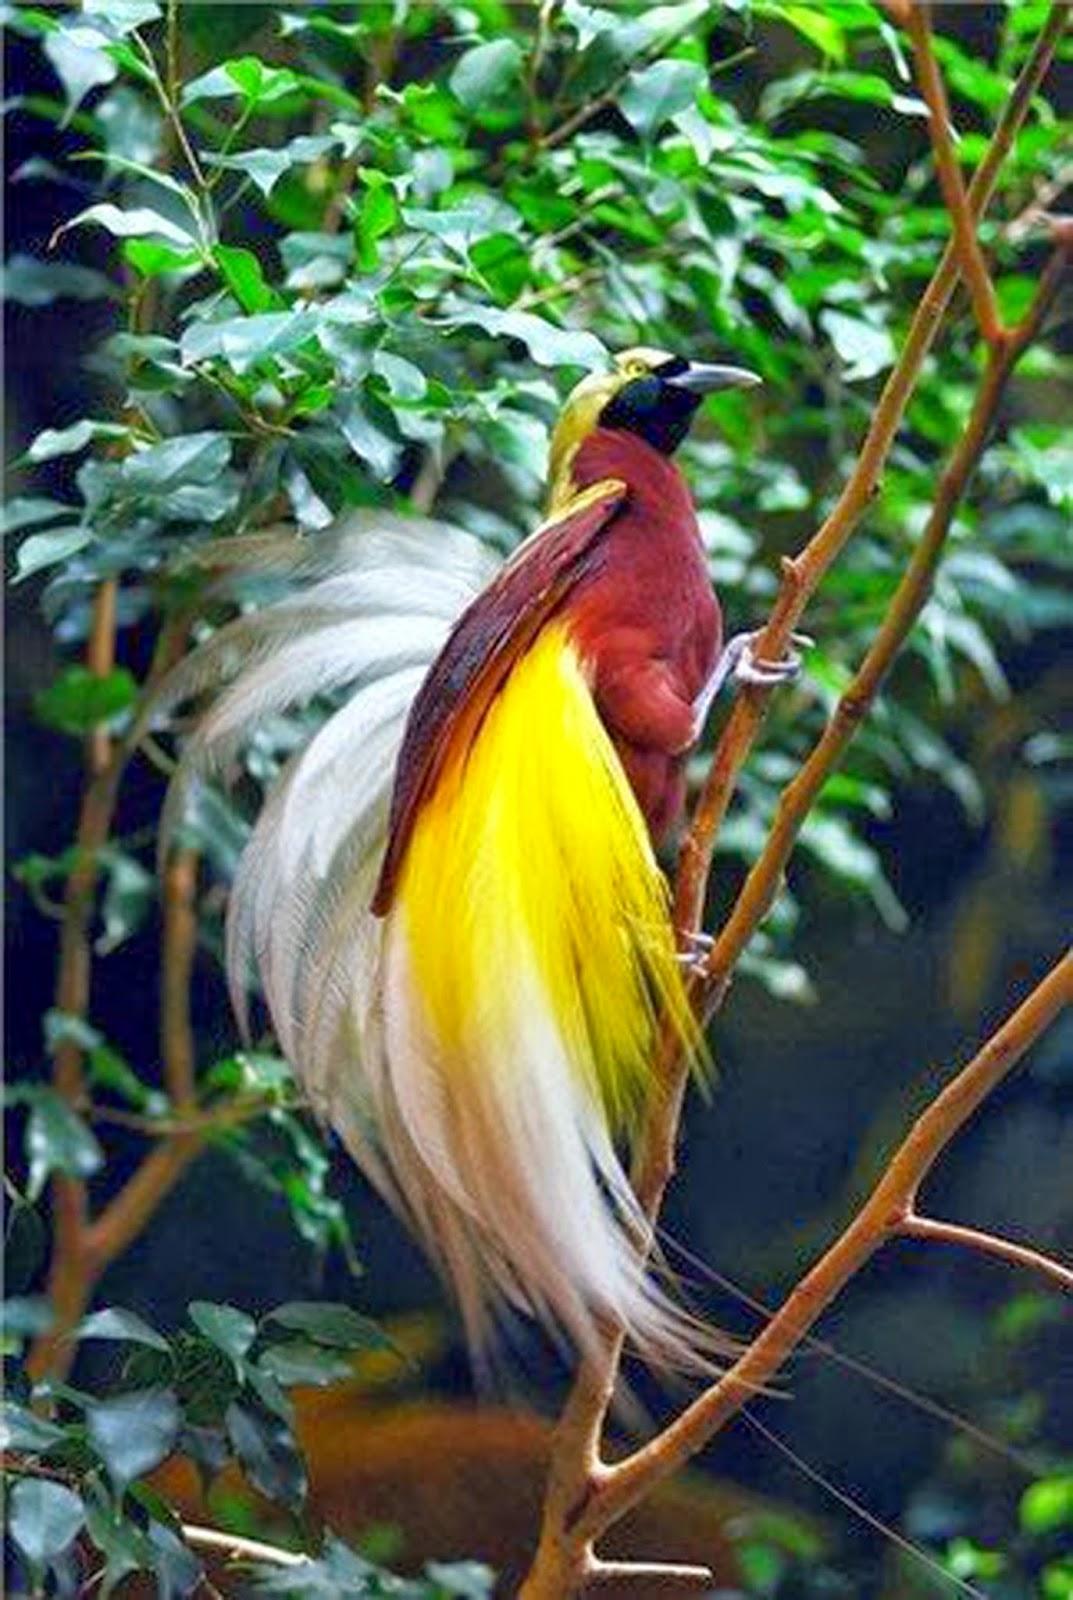 4300 Gambar Burung Cendrawasih Mewarnai HD Terbaru